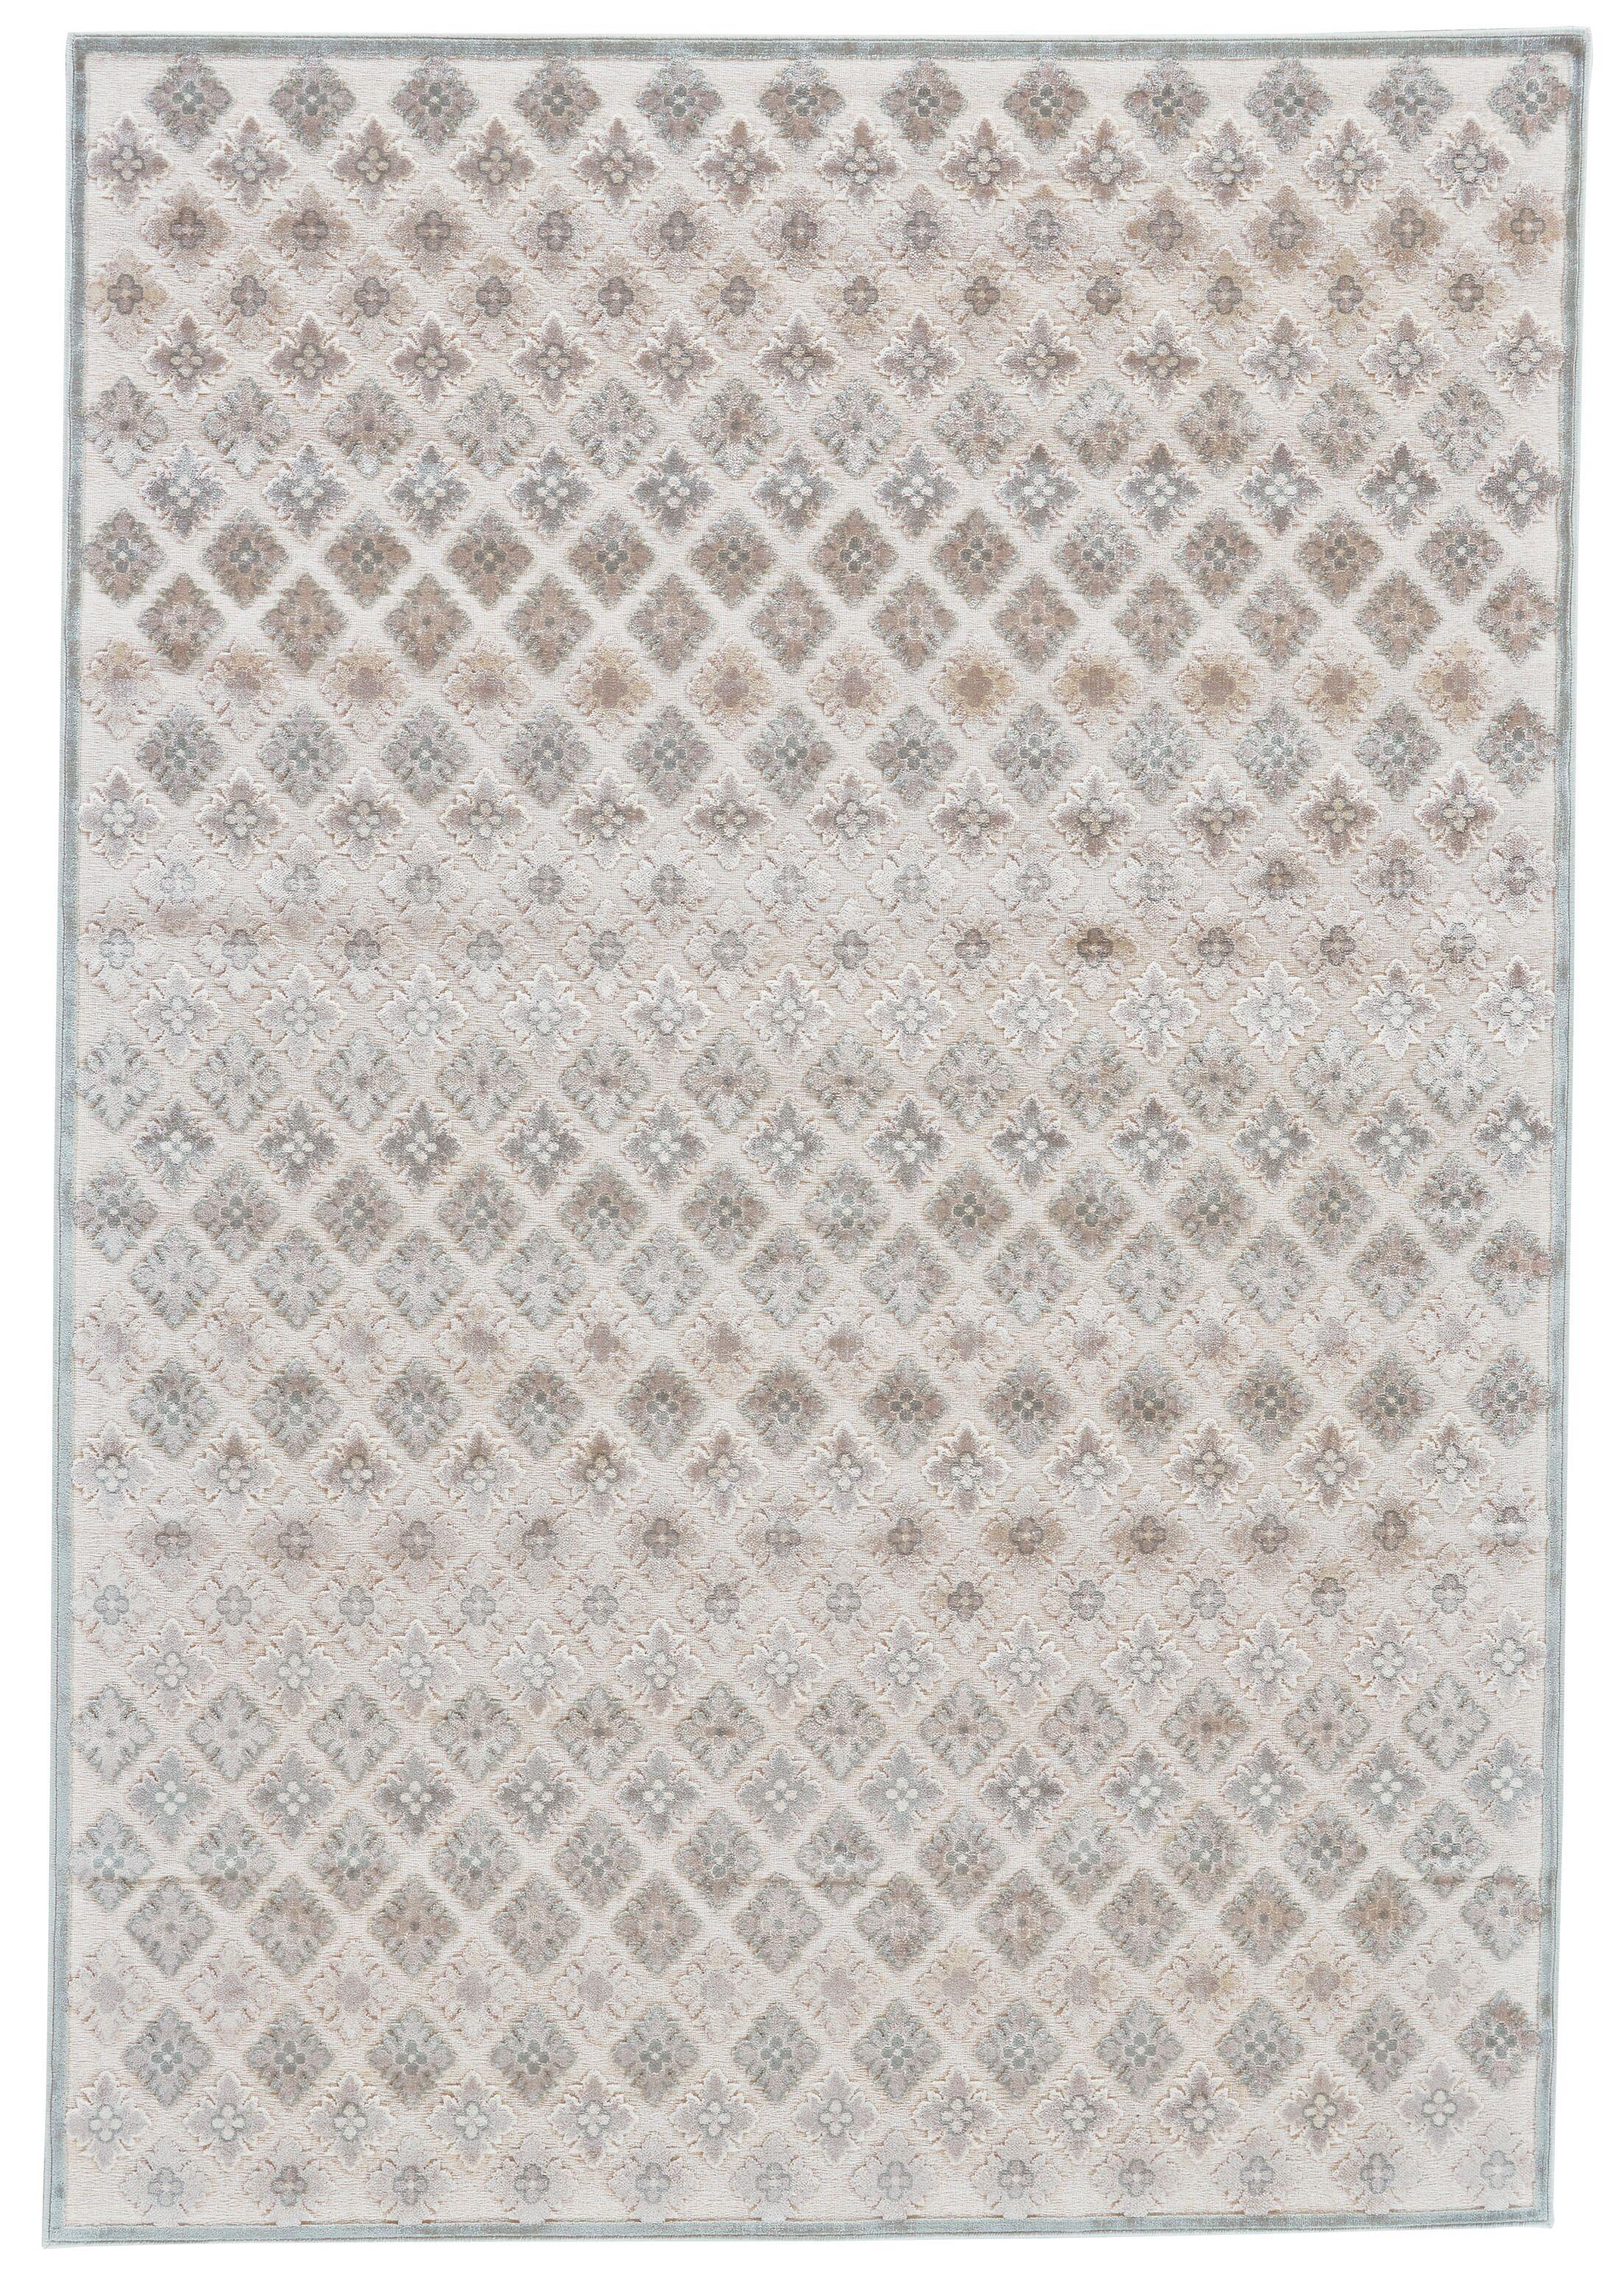 Primeaux Faux Silk Cream/Silver Area Rug Rug Size: Rectangle 5'3